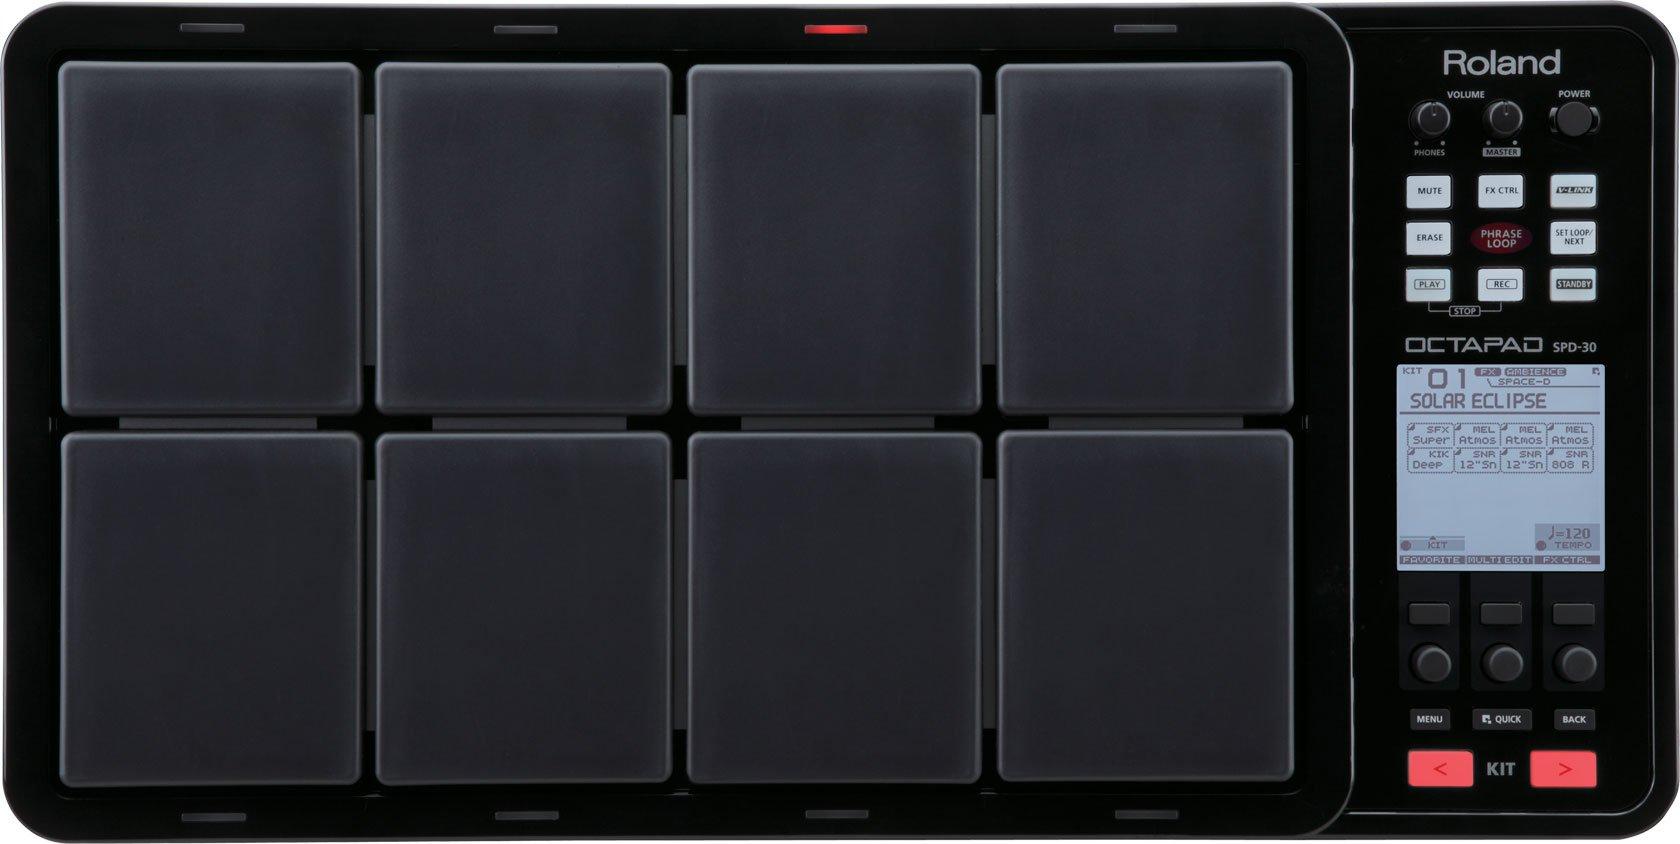 Roland OCTAPAD Digital Percussion Pad, black (SPD-30-BK) by Roland (Image #1)